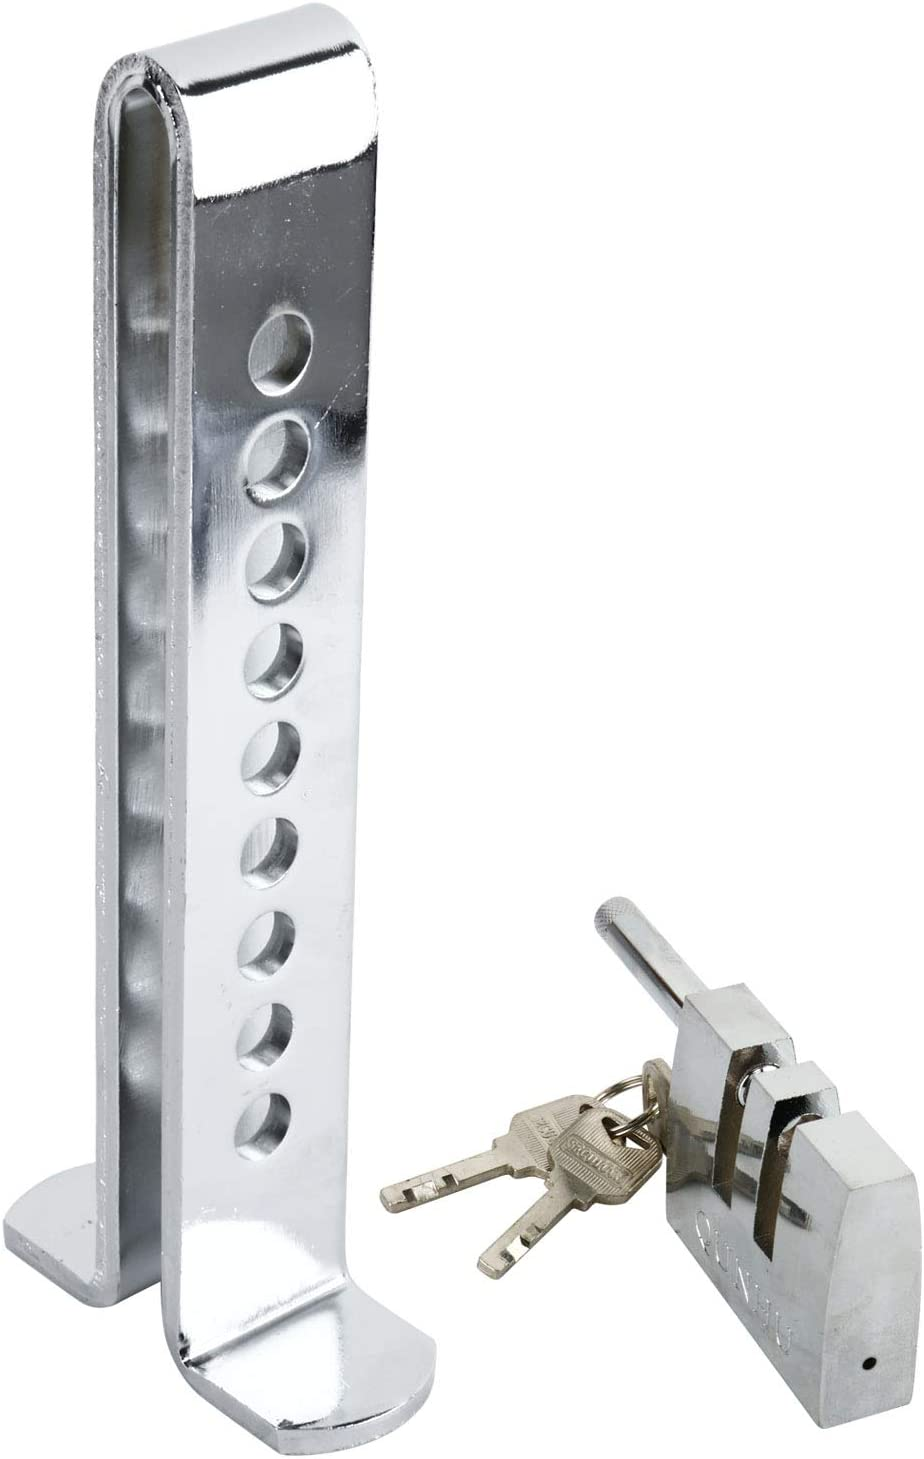 YaeTek 9 Holes Brake Pedal Lock Security Car Auto Stainless Steel Clutch Lock Anti-theft Device